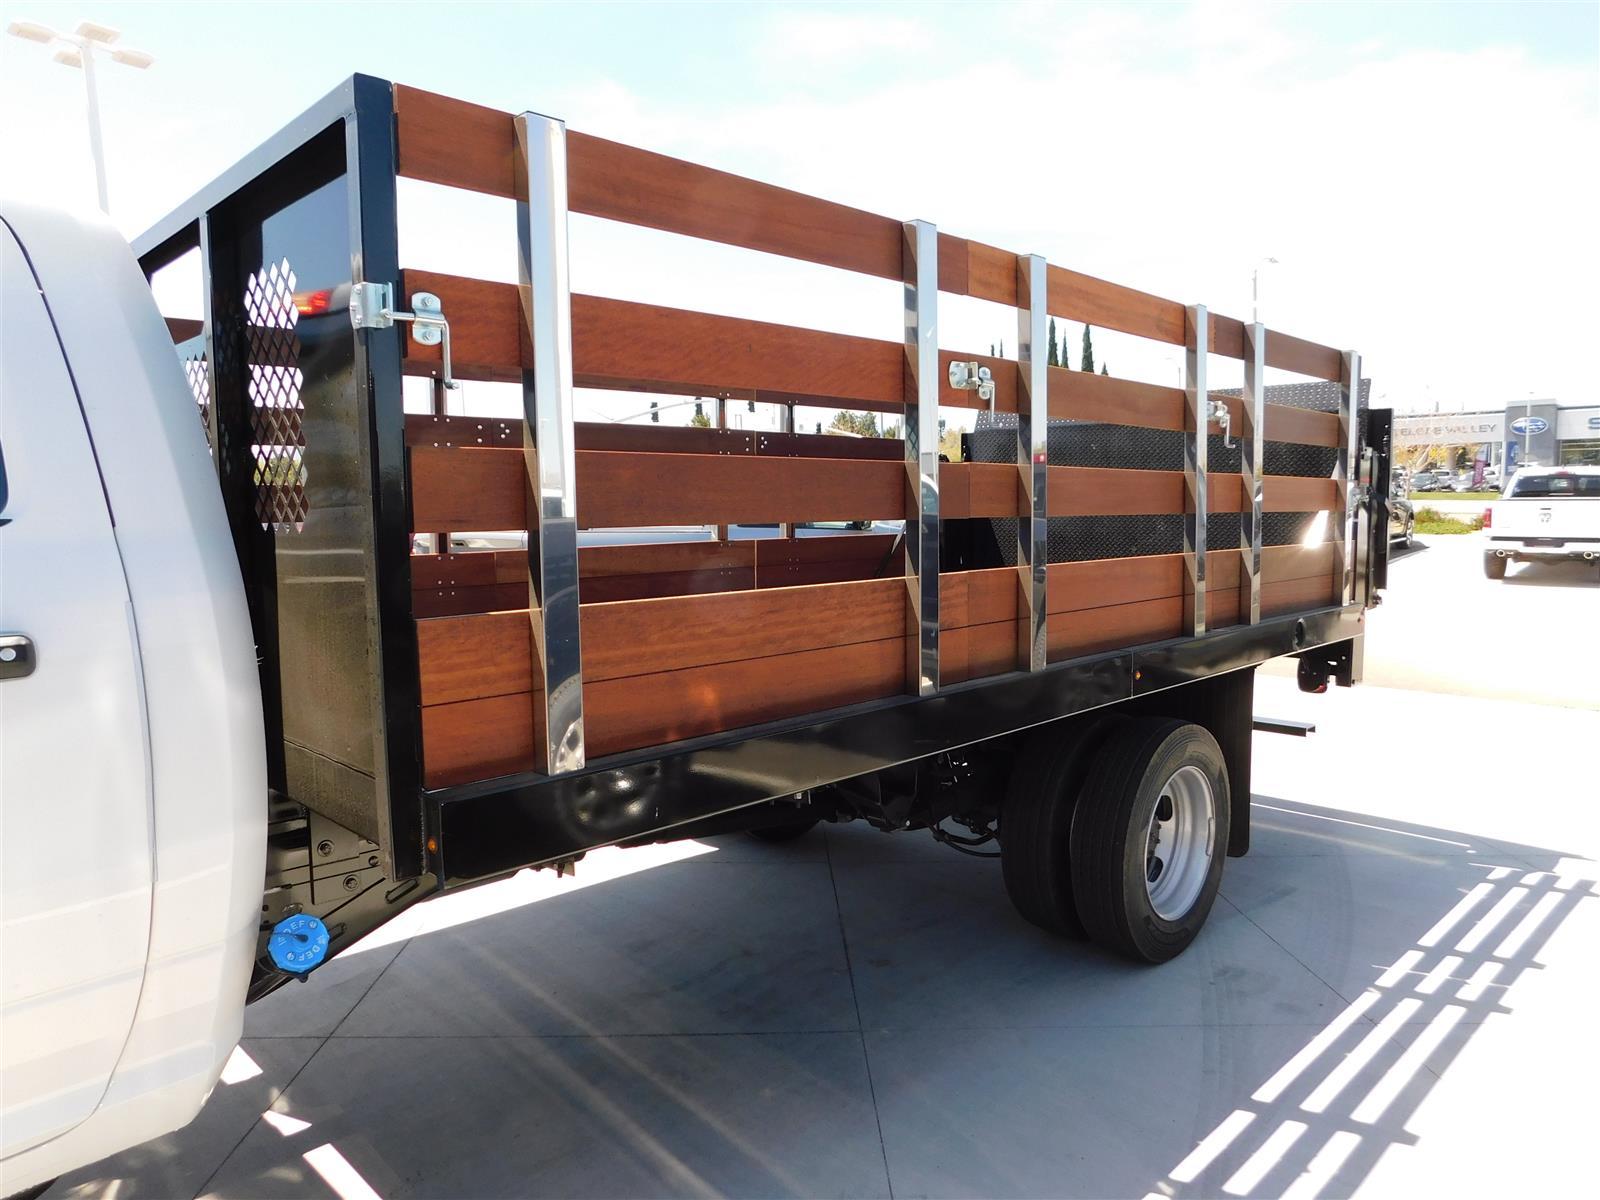 2020 Ram 5500 Regular Cab DRW 4x2, Harbor Stake Bed #XCC54531 - photo 1